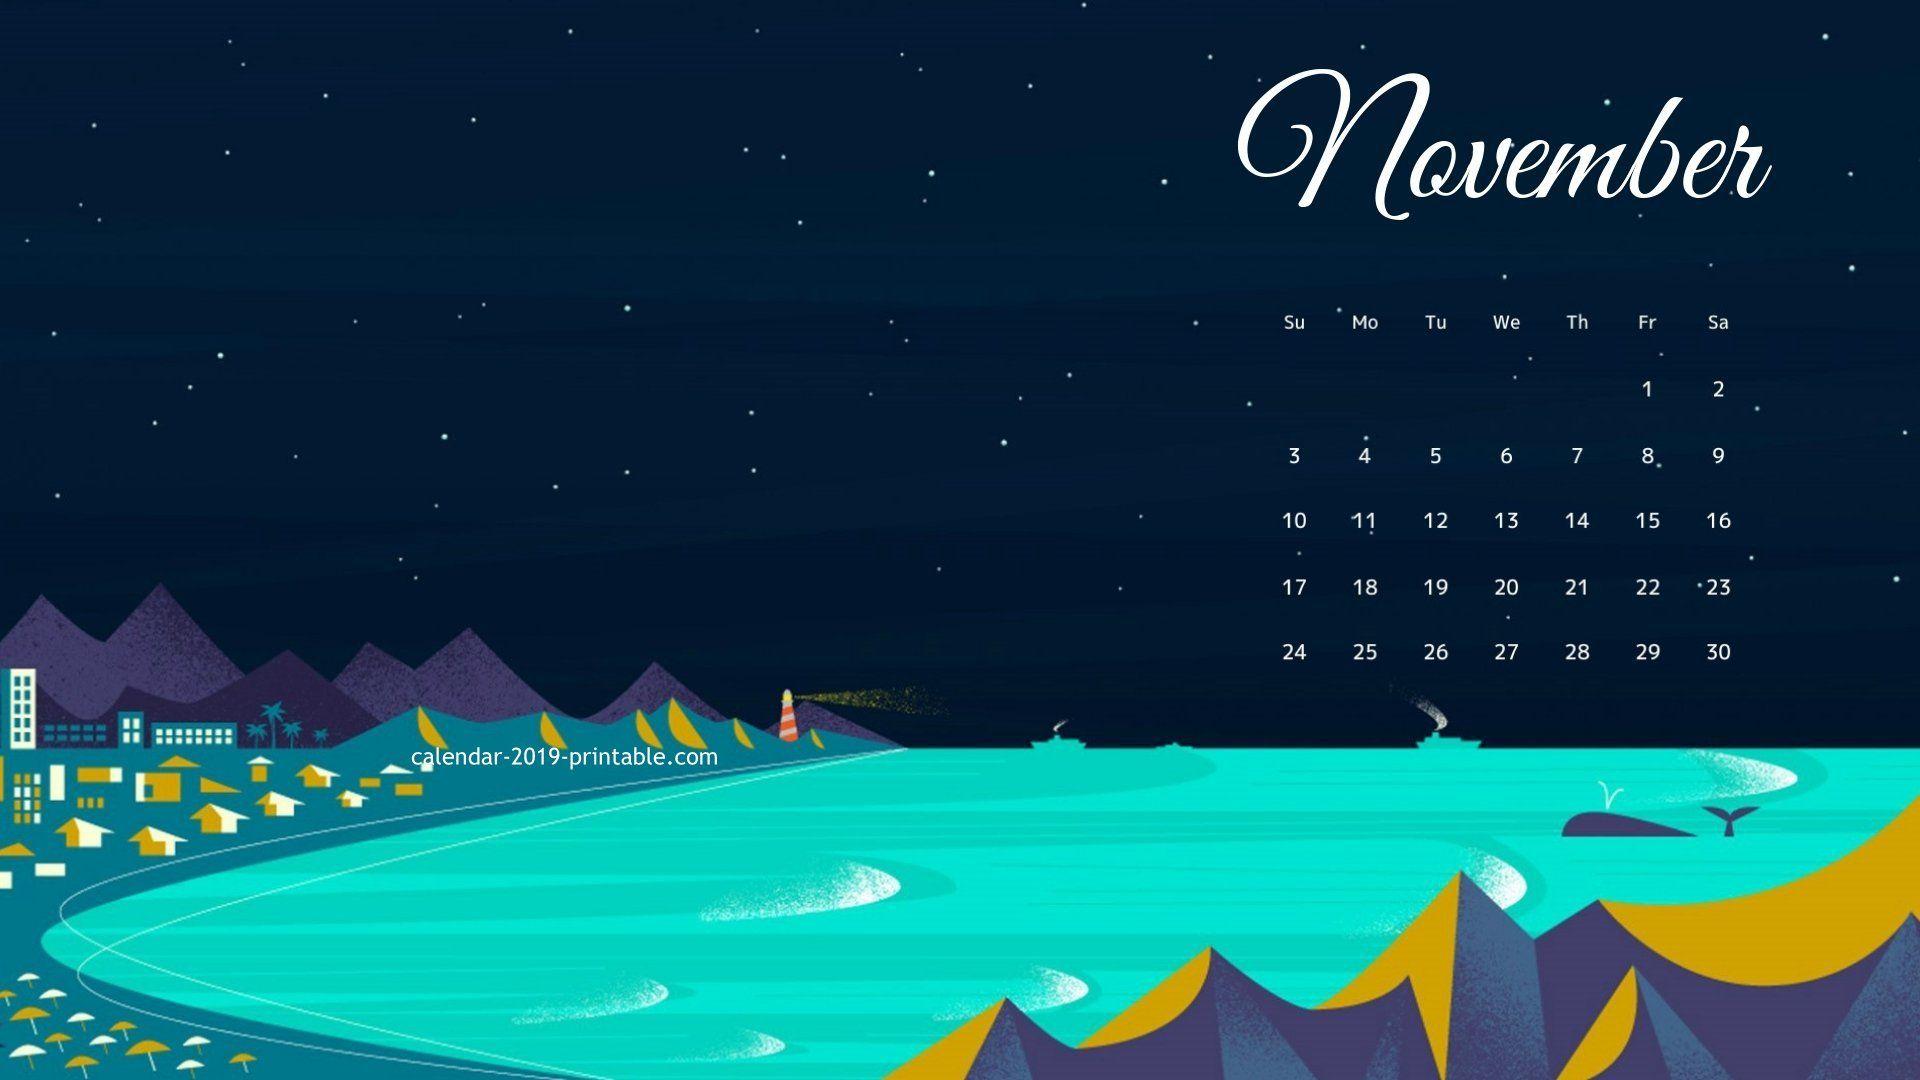 November 2019 Wallpaper Calendar